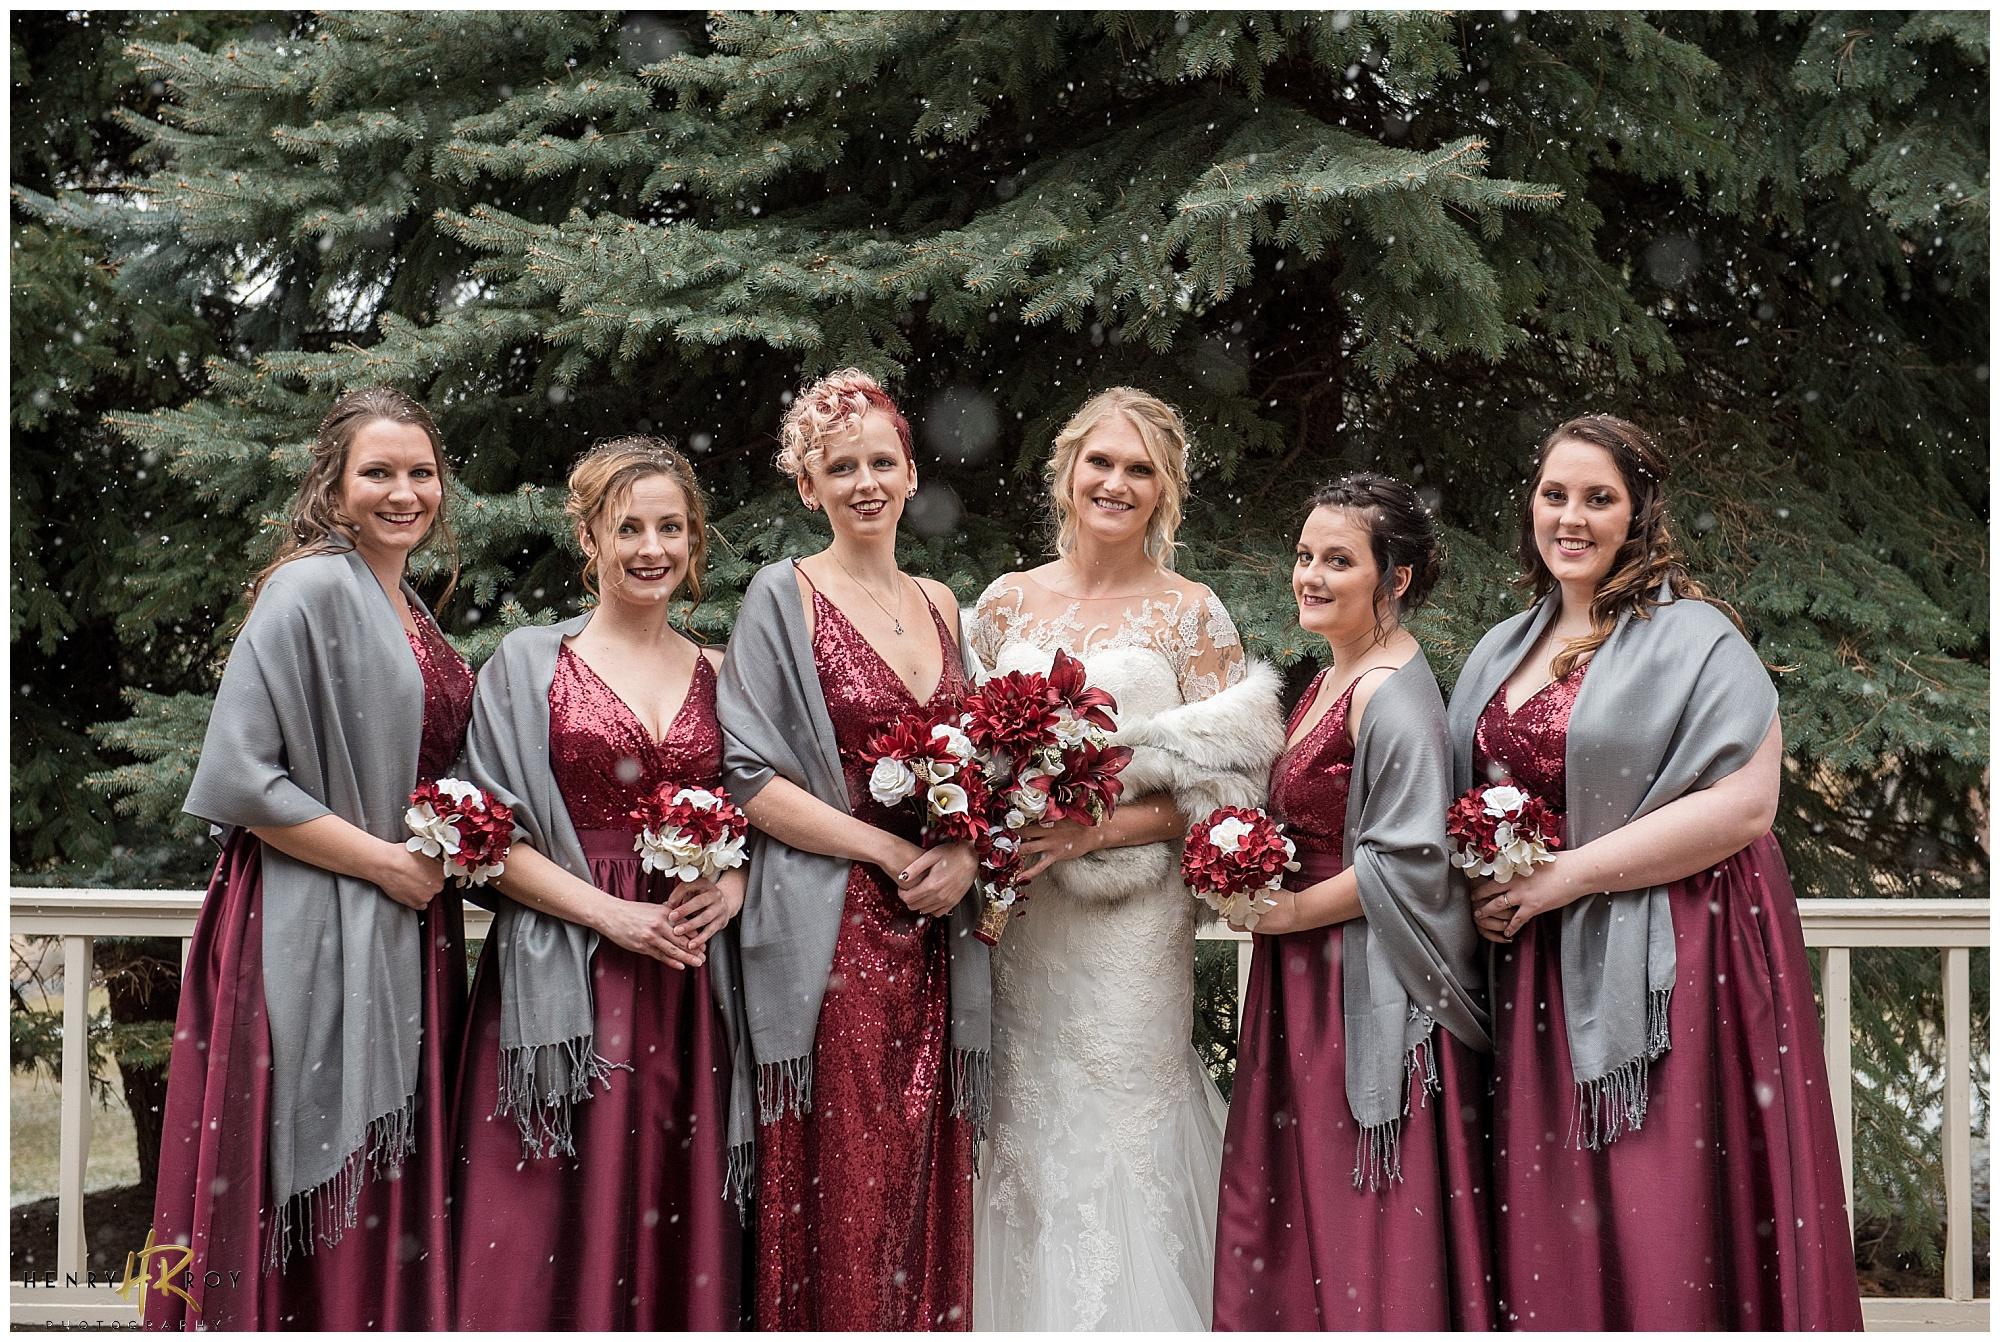 WEDDING PHOTOGRAPHER0018.jpg